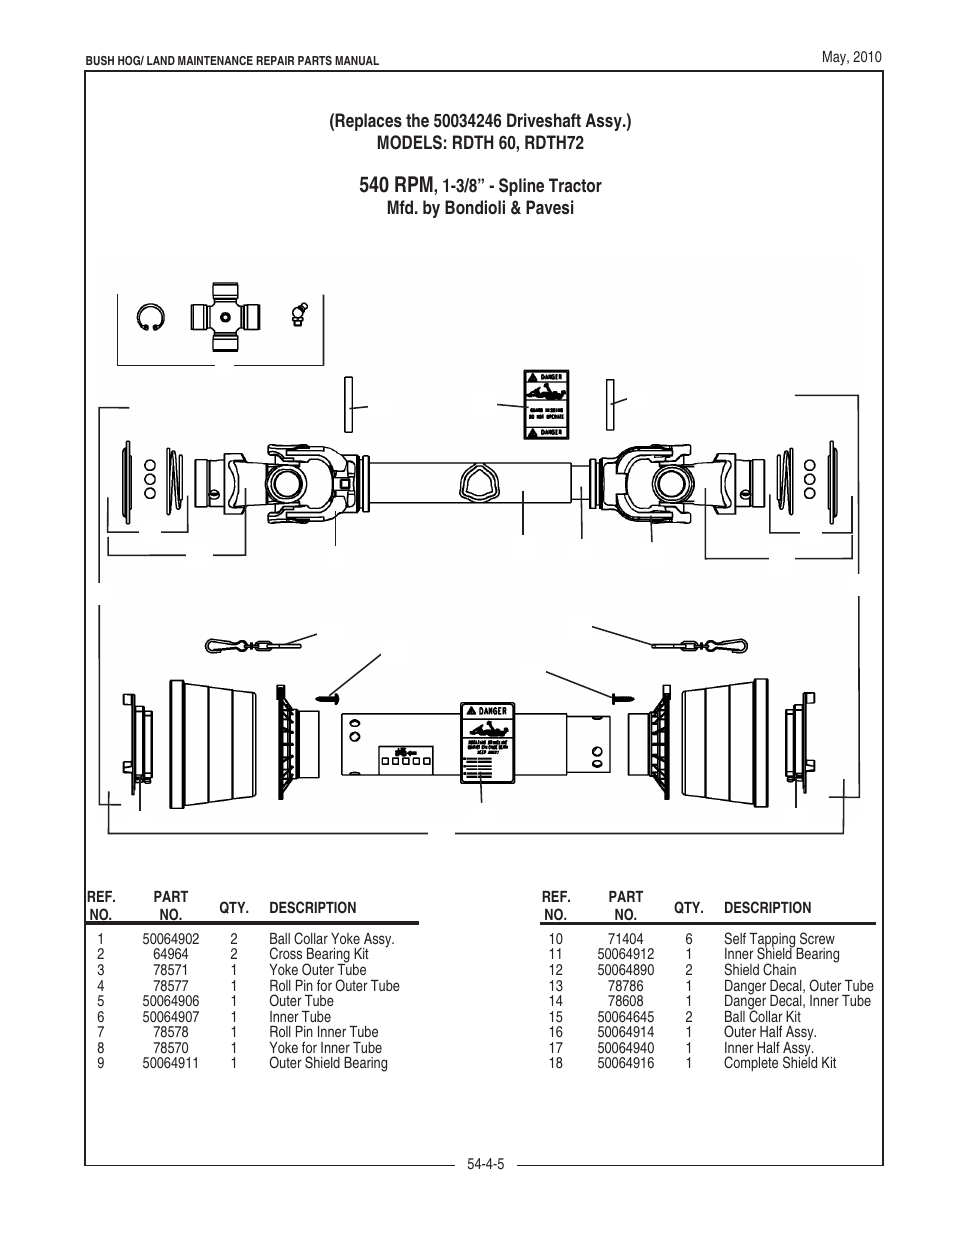 hight resolution of 540 rpm bush hog rdth series rdth 72 user manual page 19 28